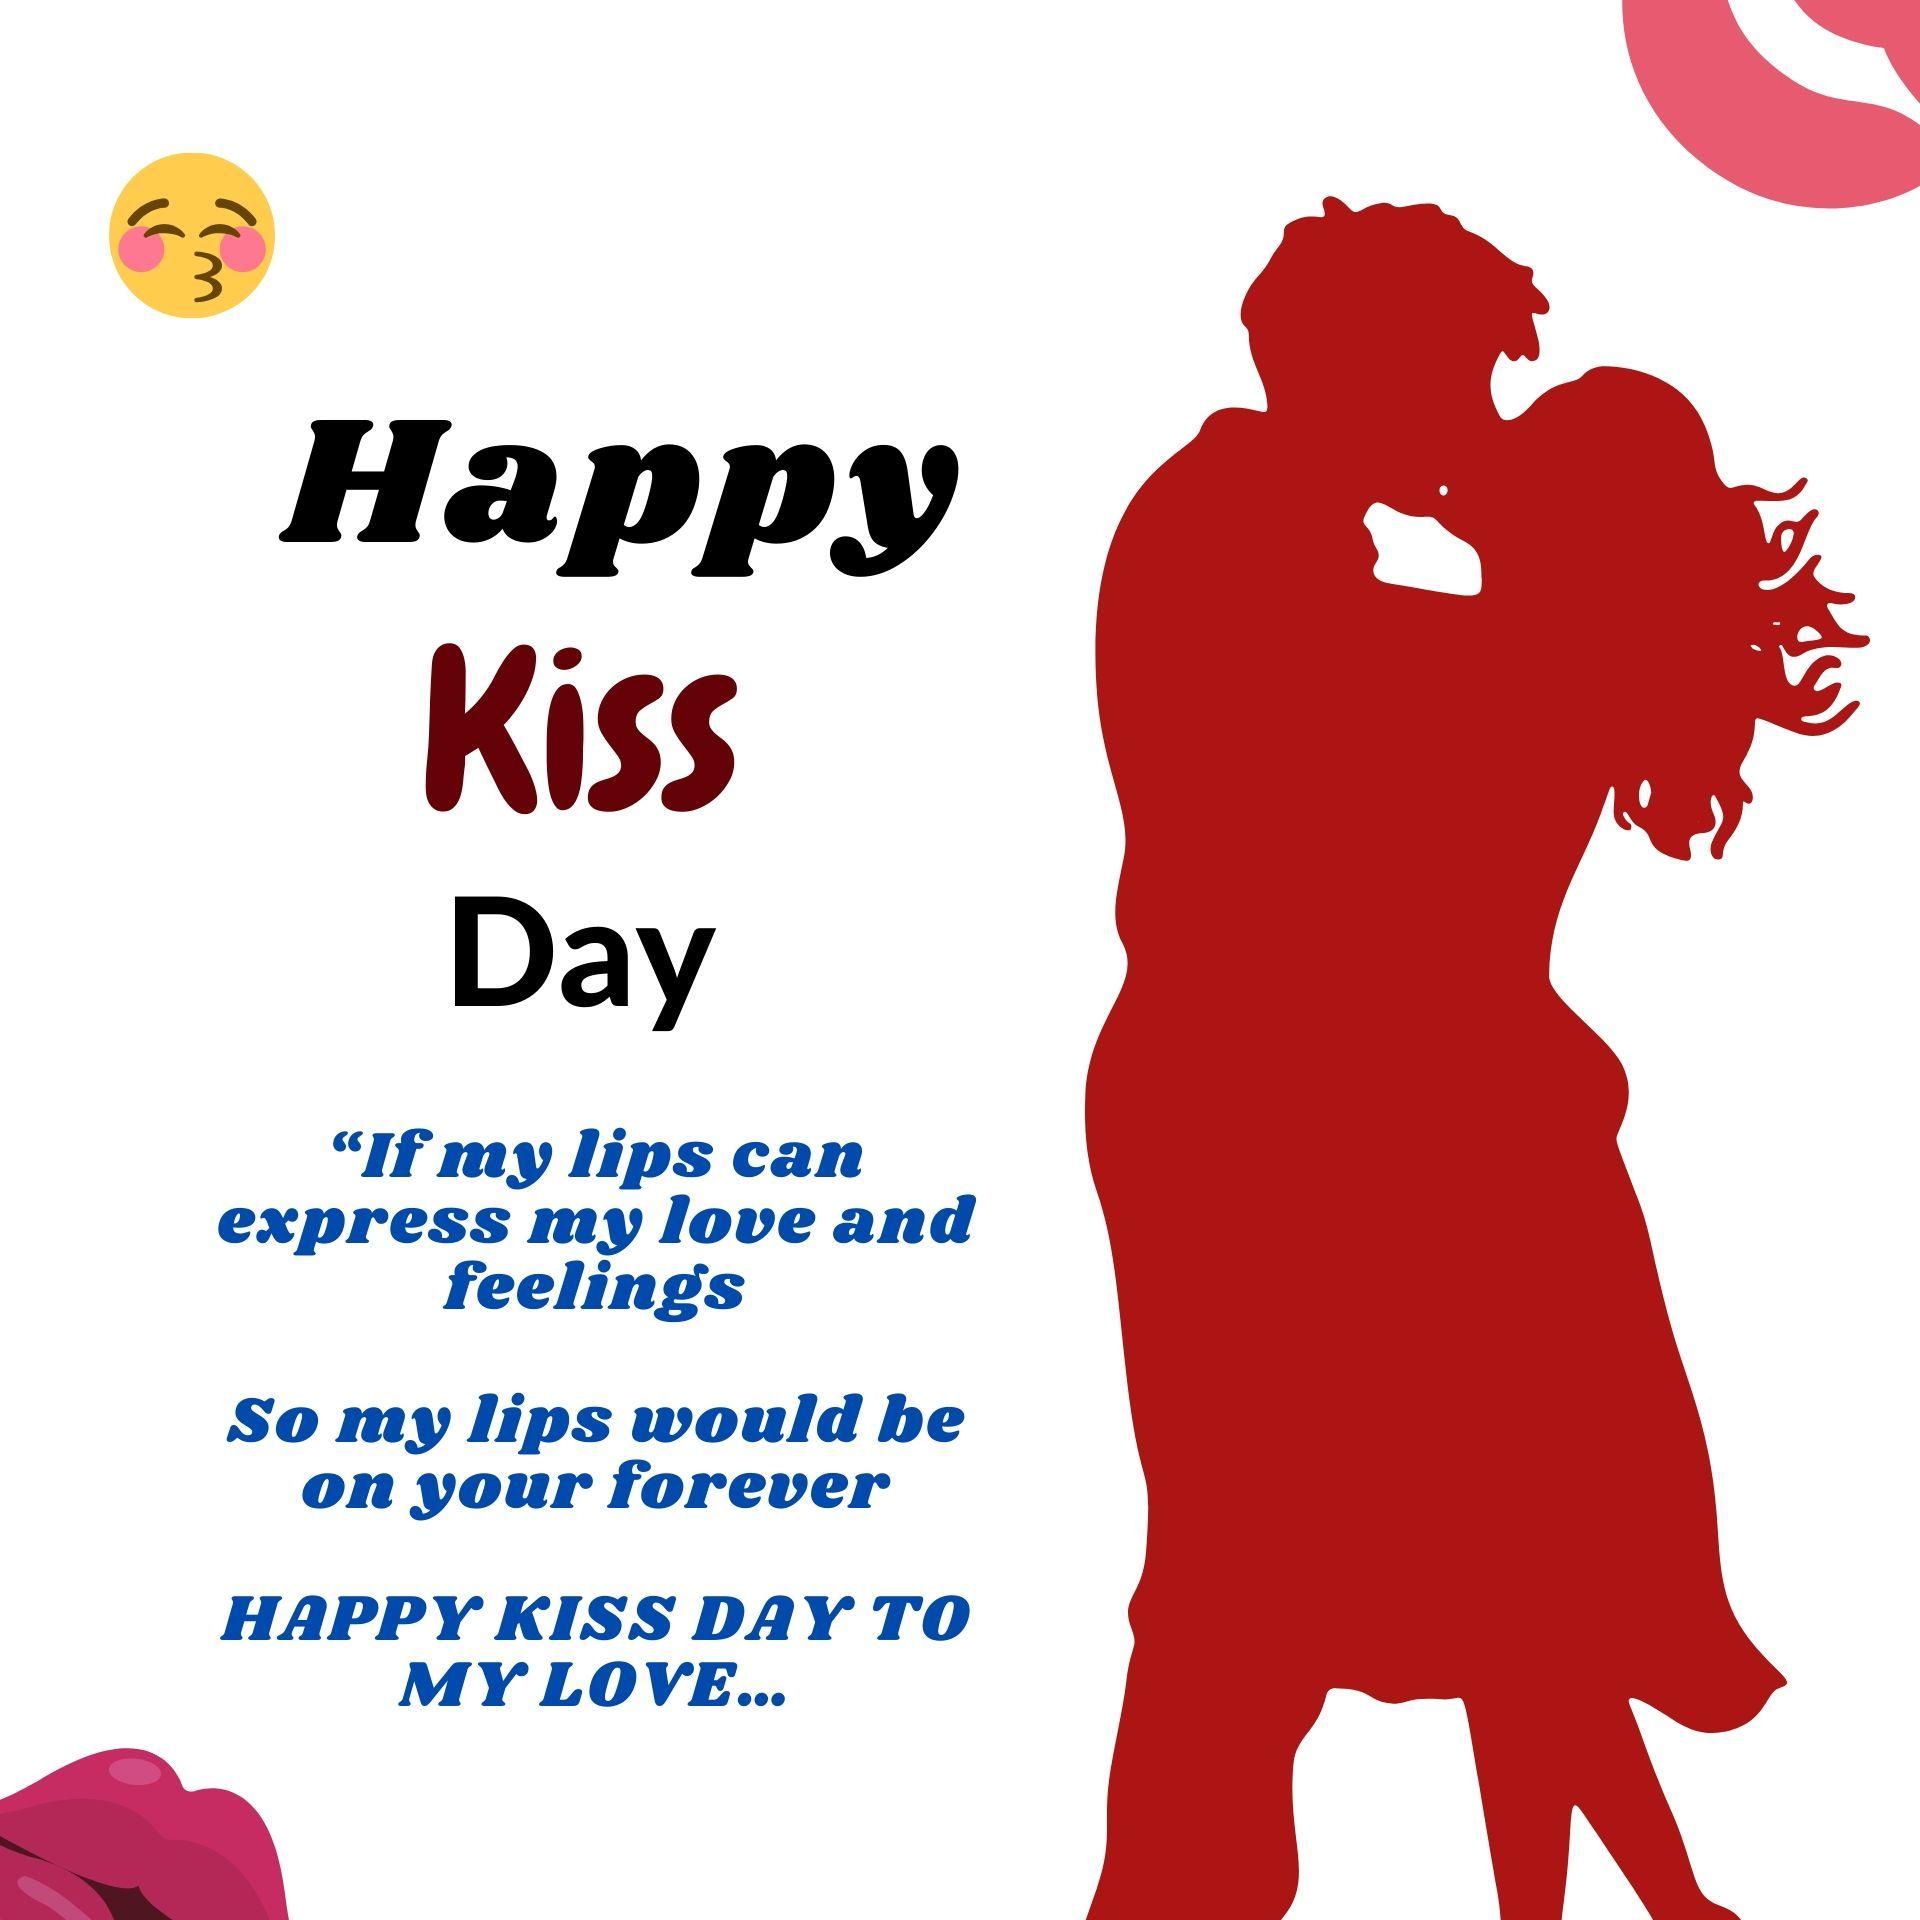 Happy World Kiss Day 2020 In 2020 World Kiss Day Kiss Day Happy Kiss Day